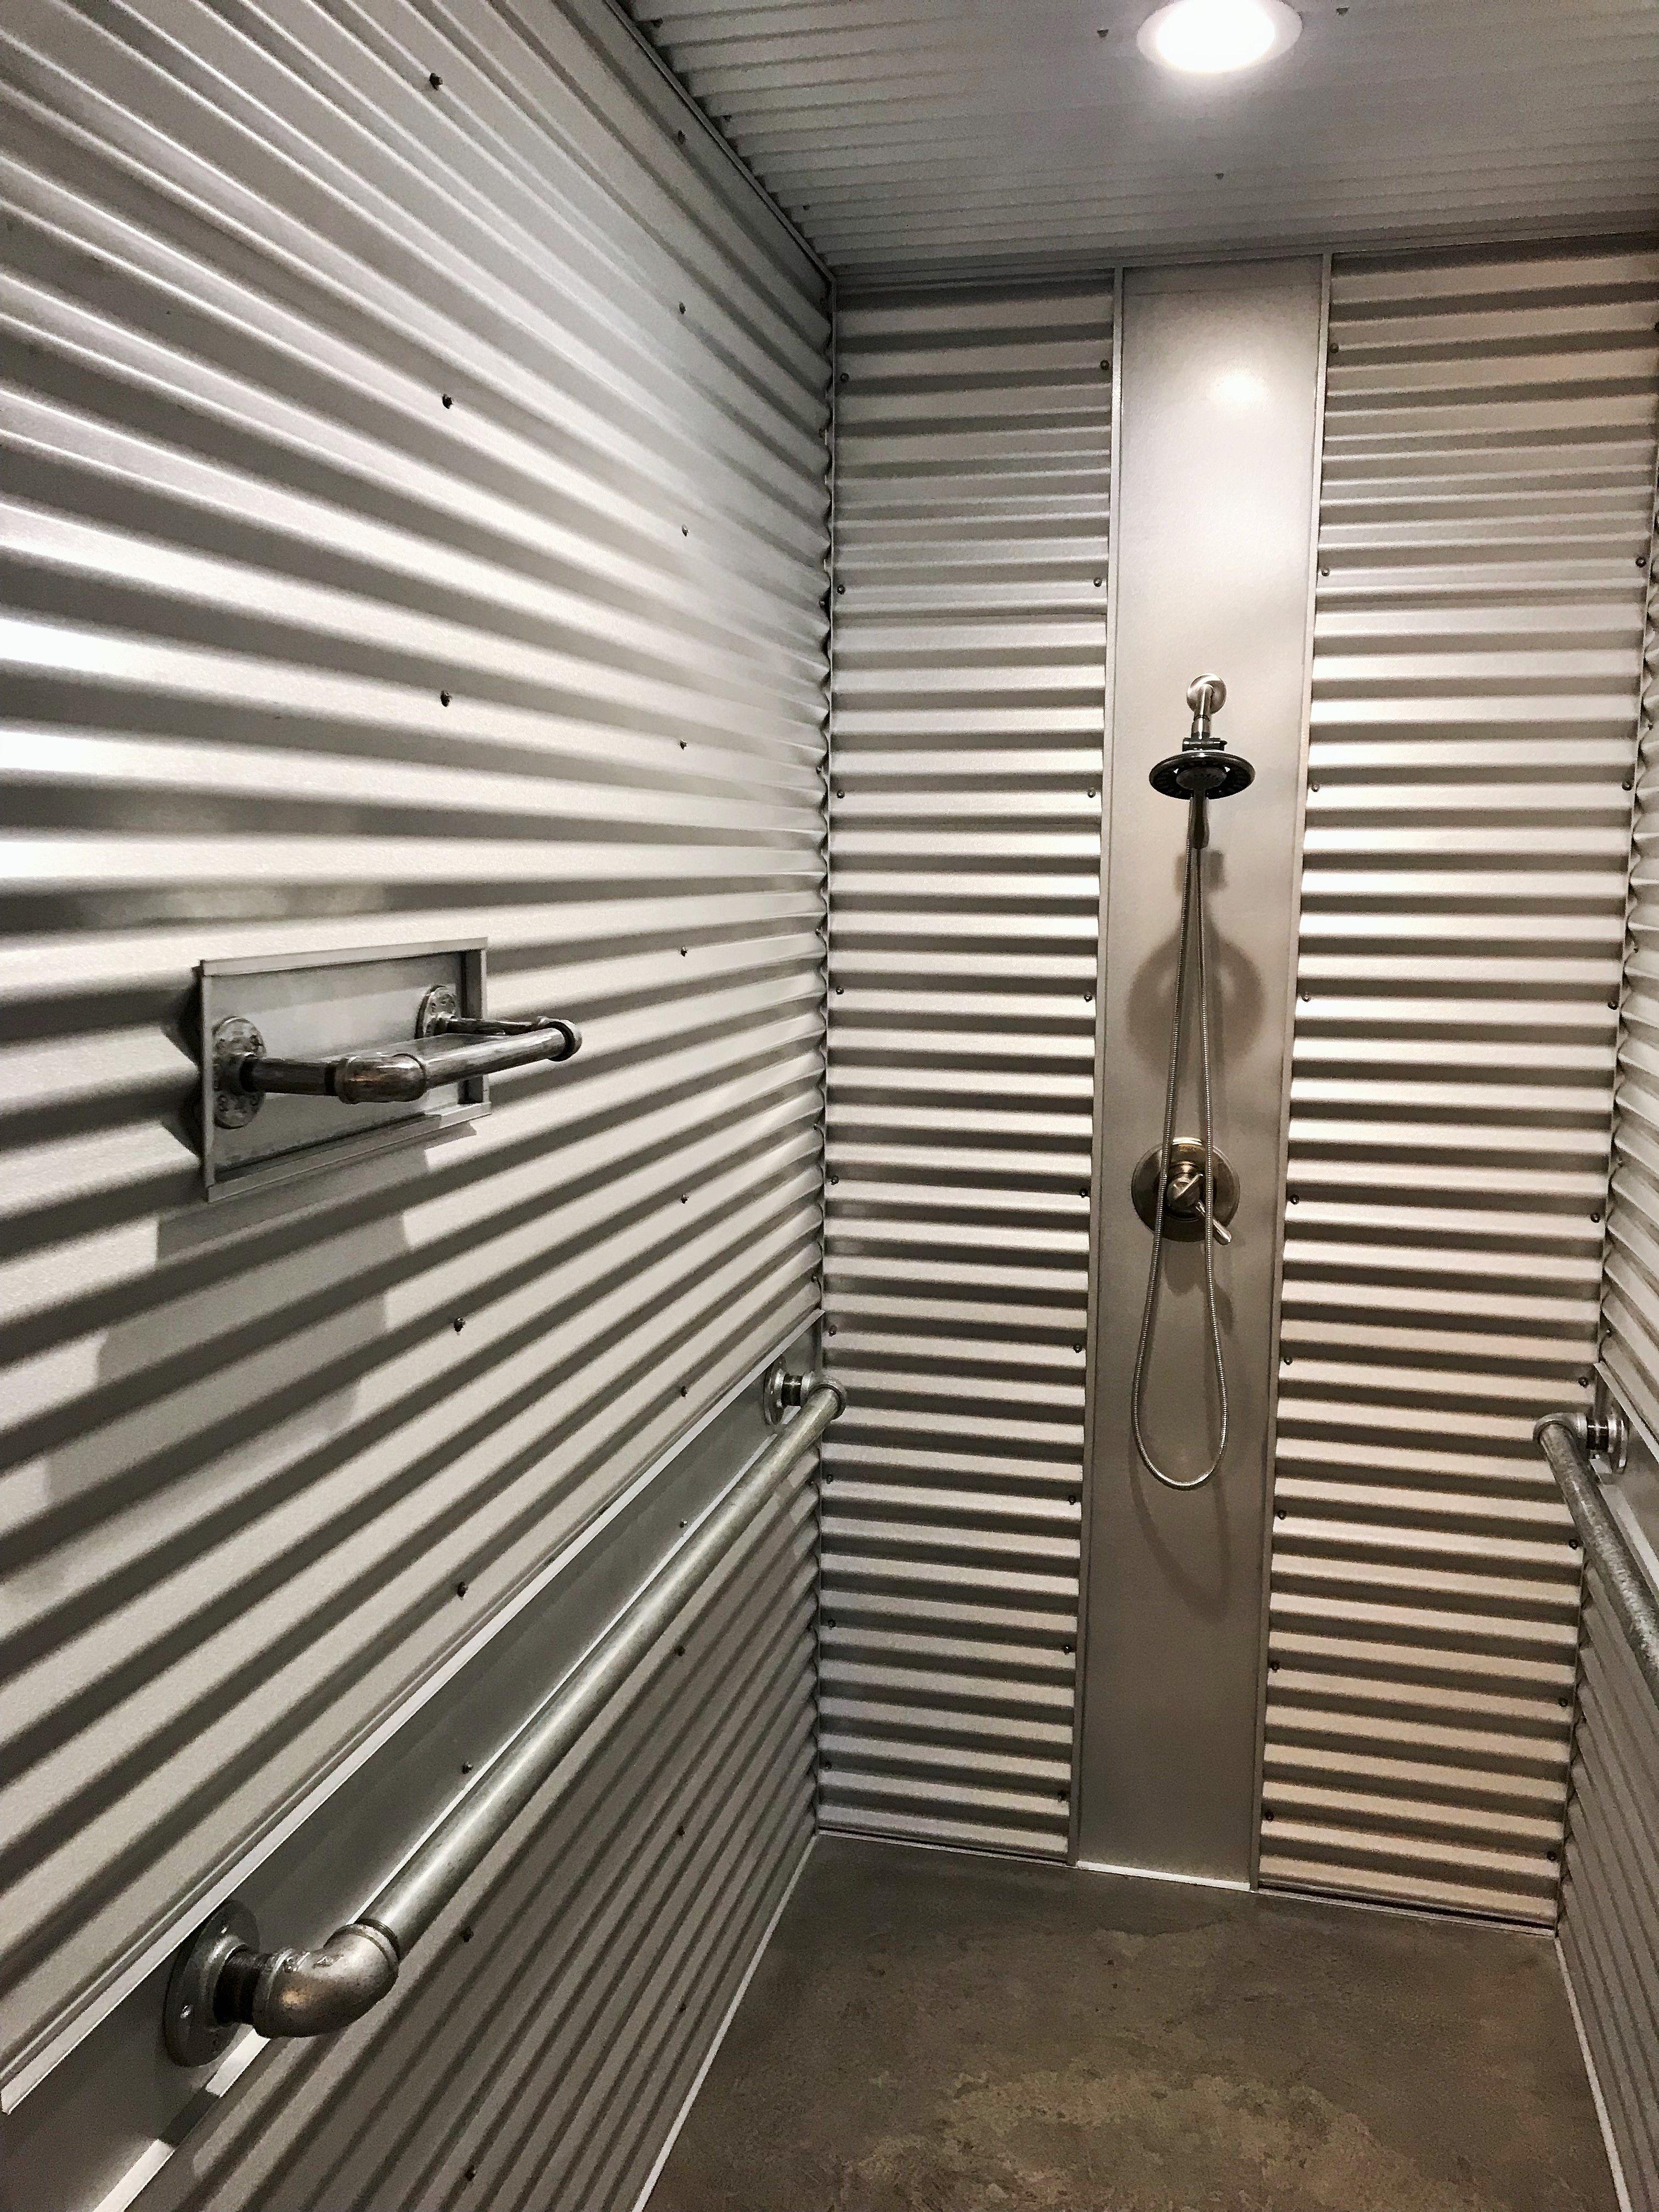 Metal Shower Walls : metal, shower, walls, Corrugated, Metal, Shower, Walls, Walls,, Galvanized, Shower,